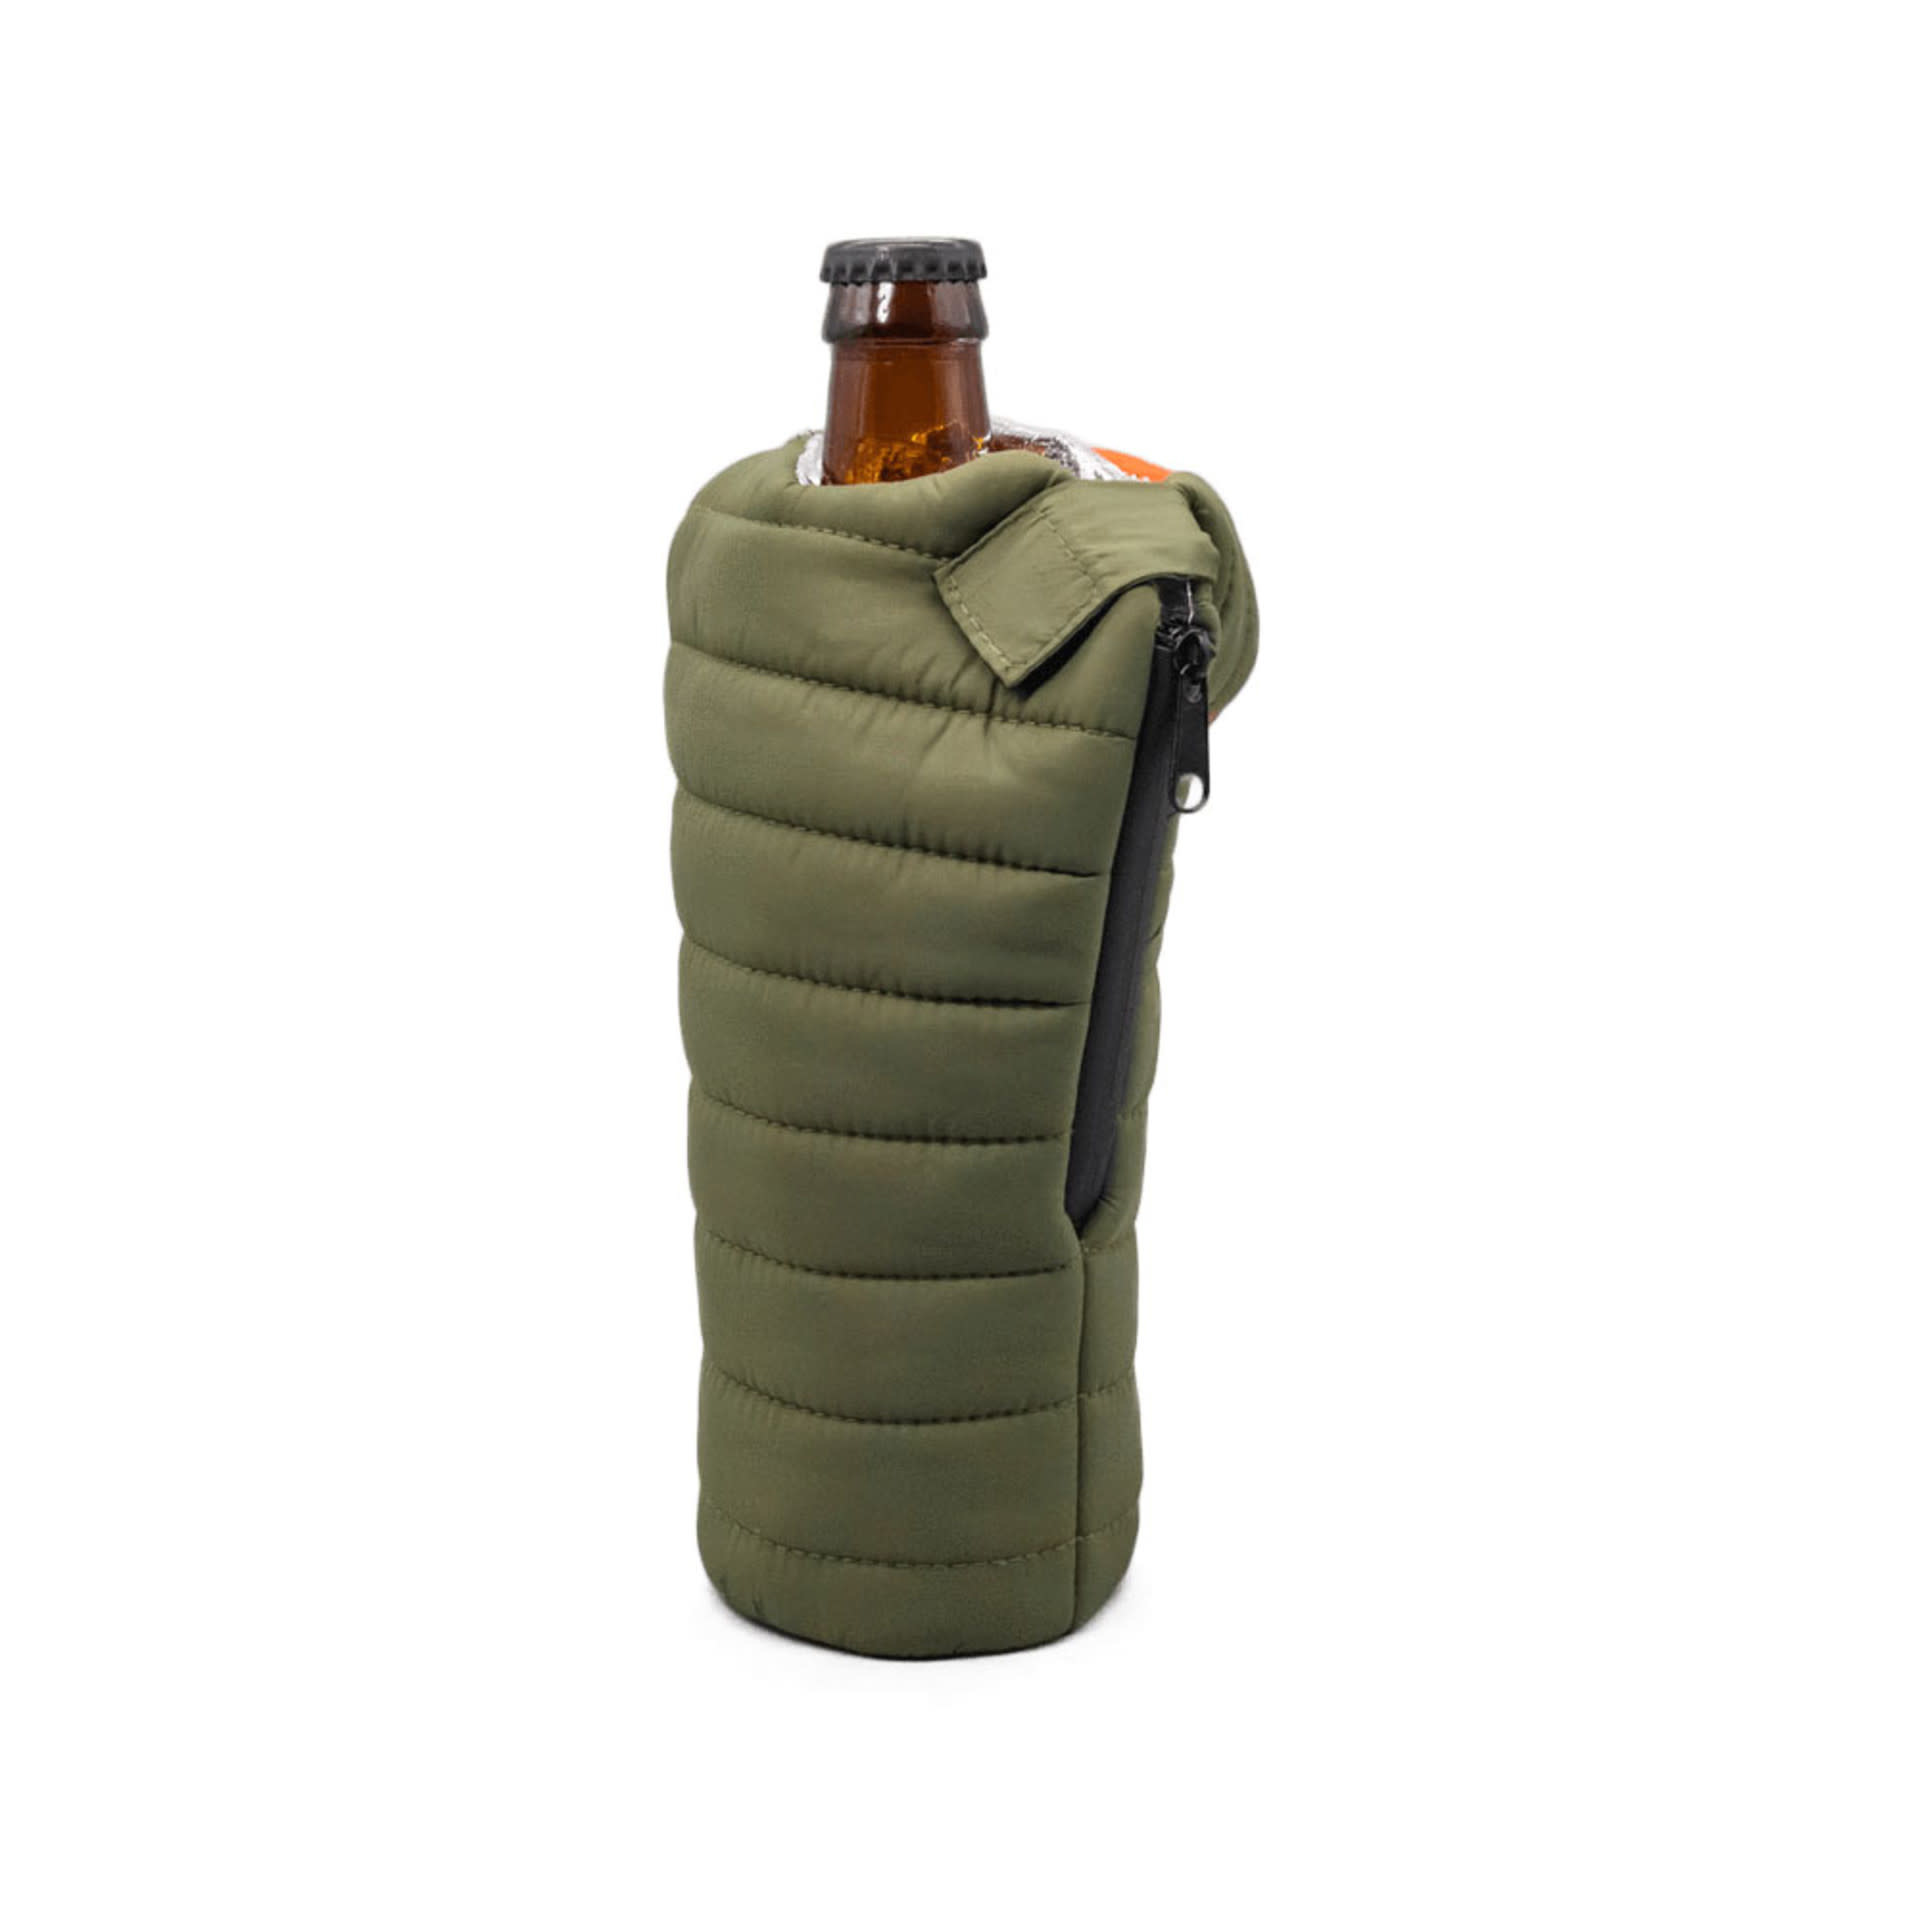 Puffin Beverage Bag Green & Orange-3